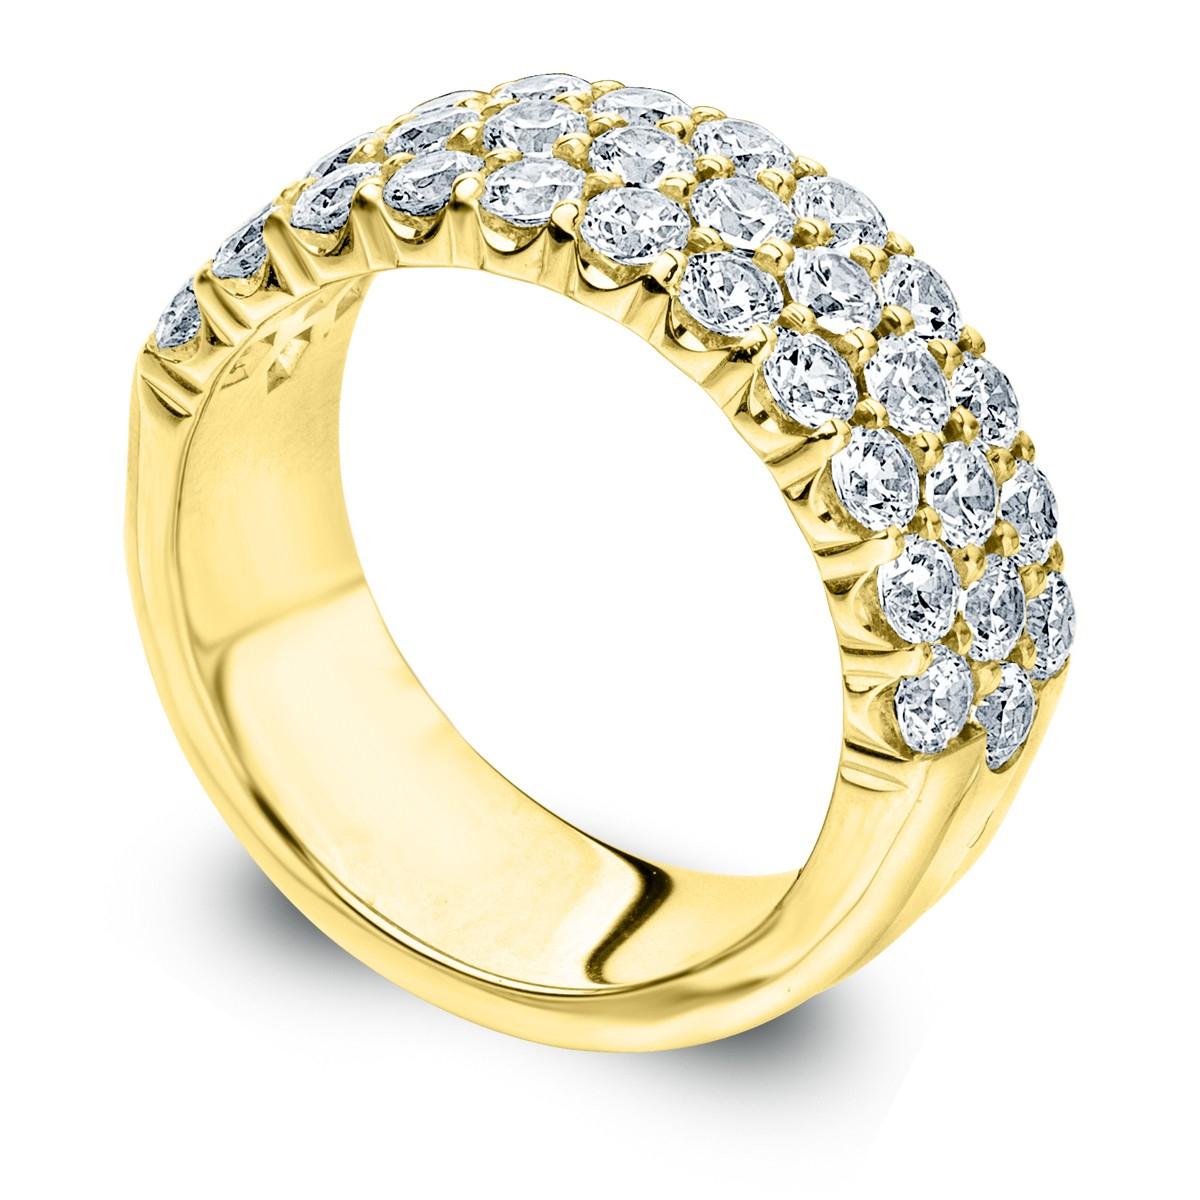 Three Row Diamond Ring | 3 Row Diamond Wedding Band Regarding Most Popular Diamond Three Row Tiered Anniversary Bands In White Gold (View 2 of 25)